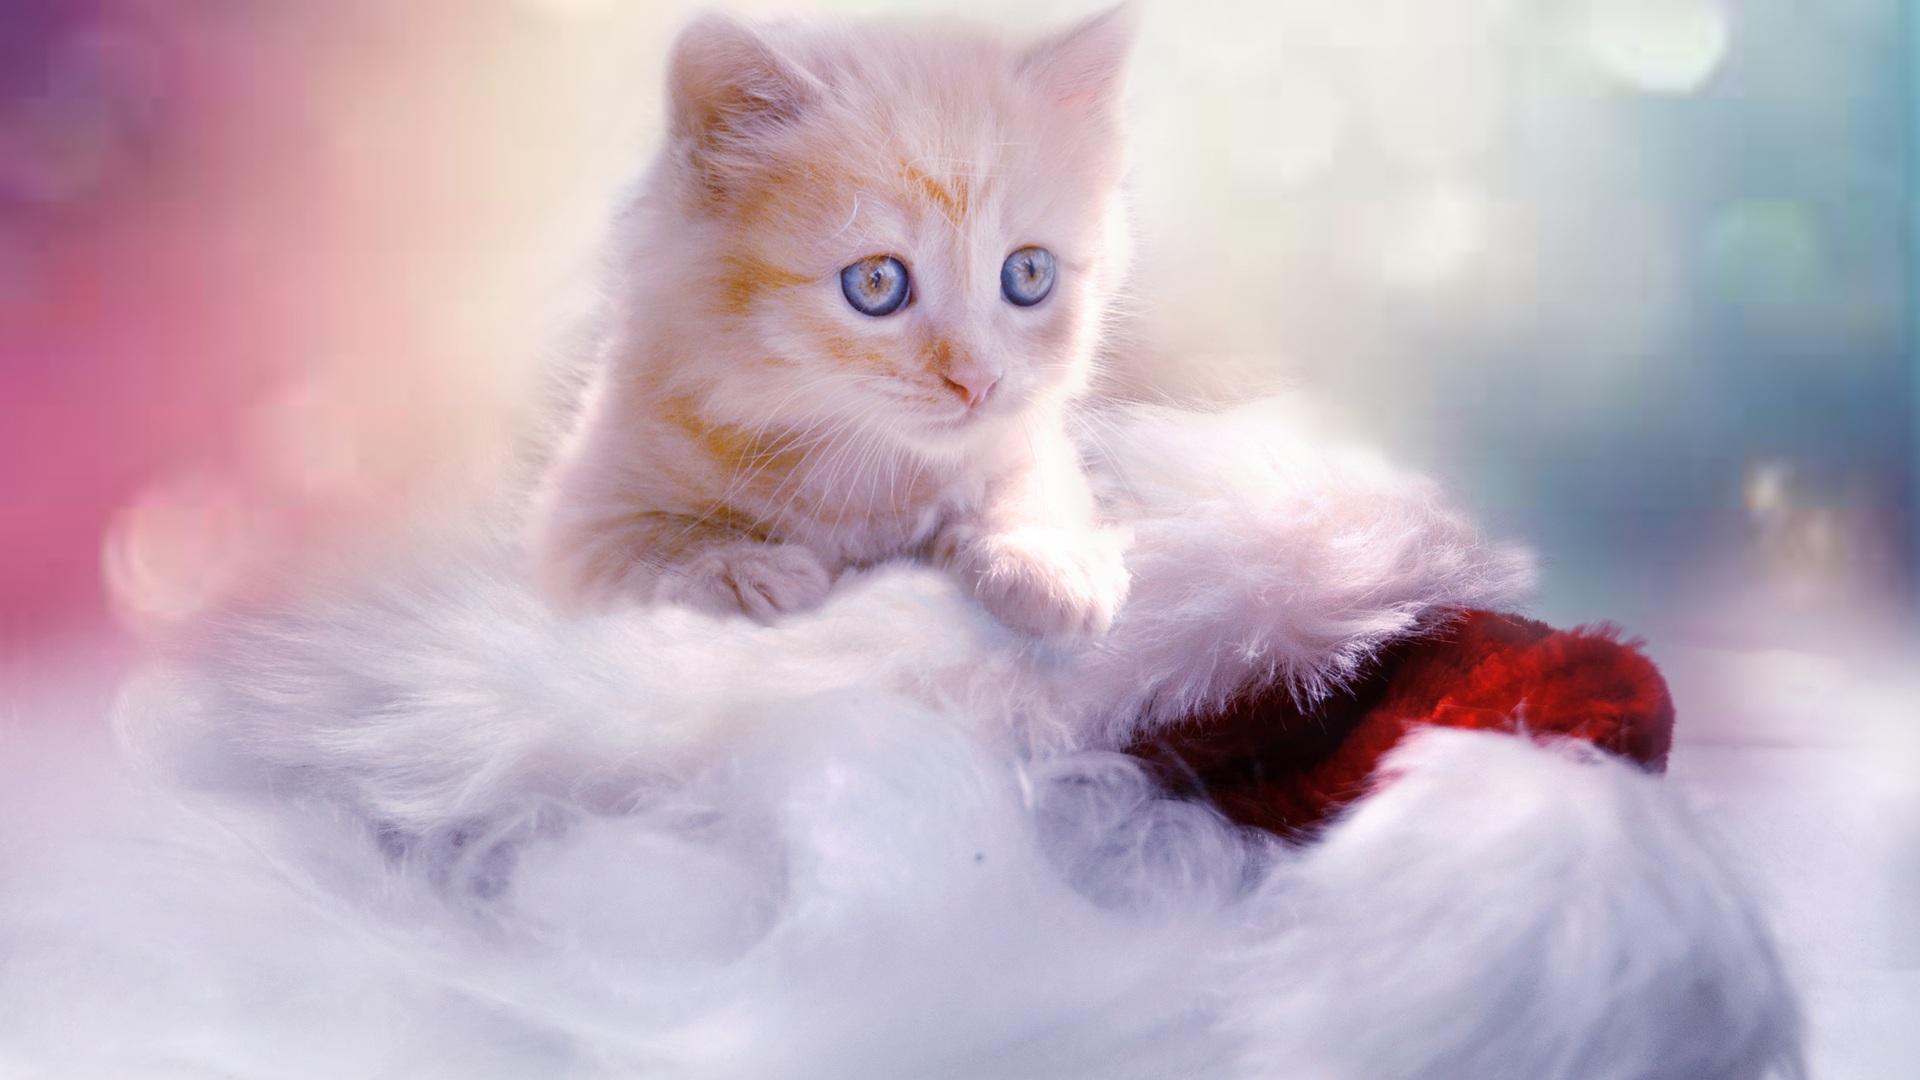 1920x1080 Christmas Kitten Laptop Full Hd 1080p Hd 4k